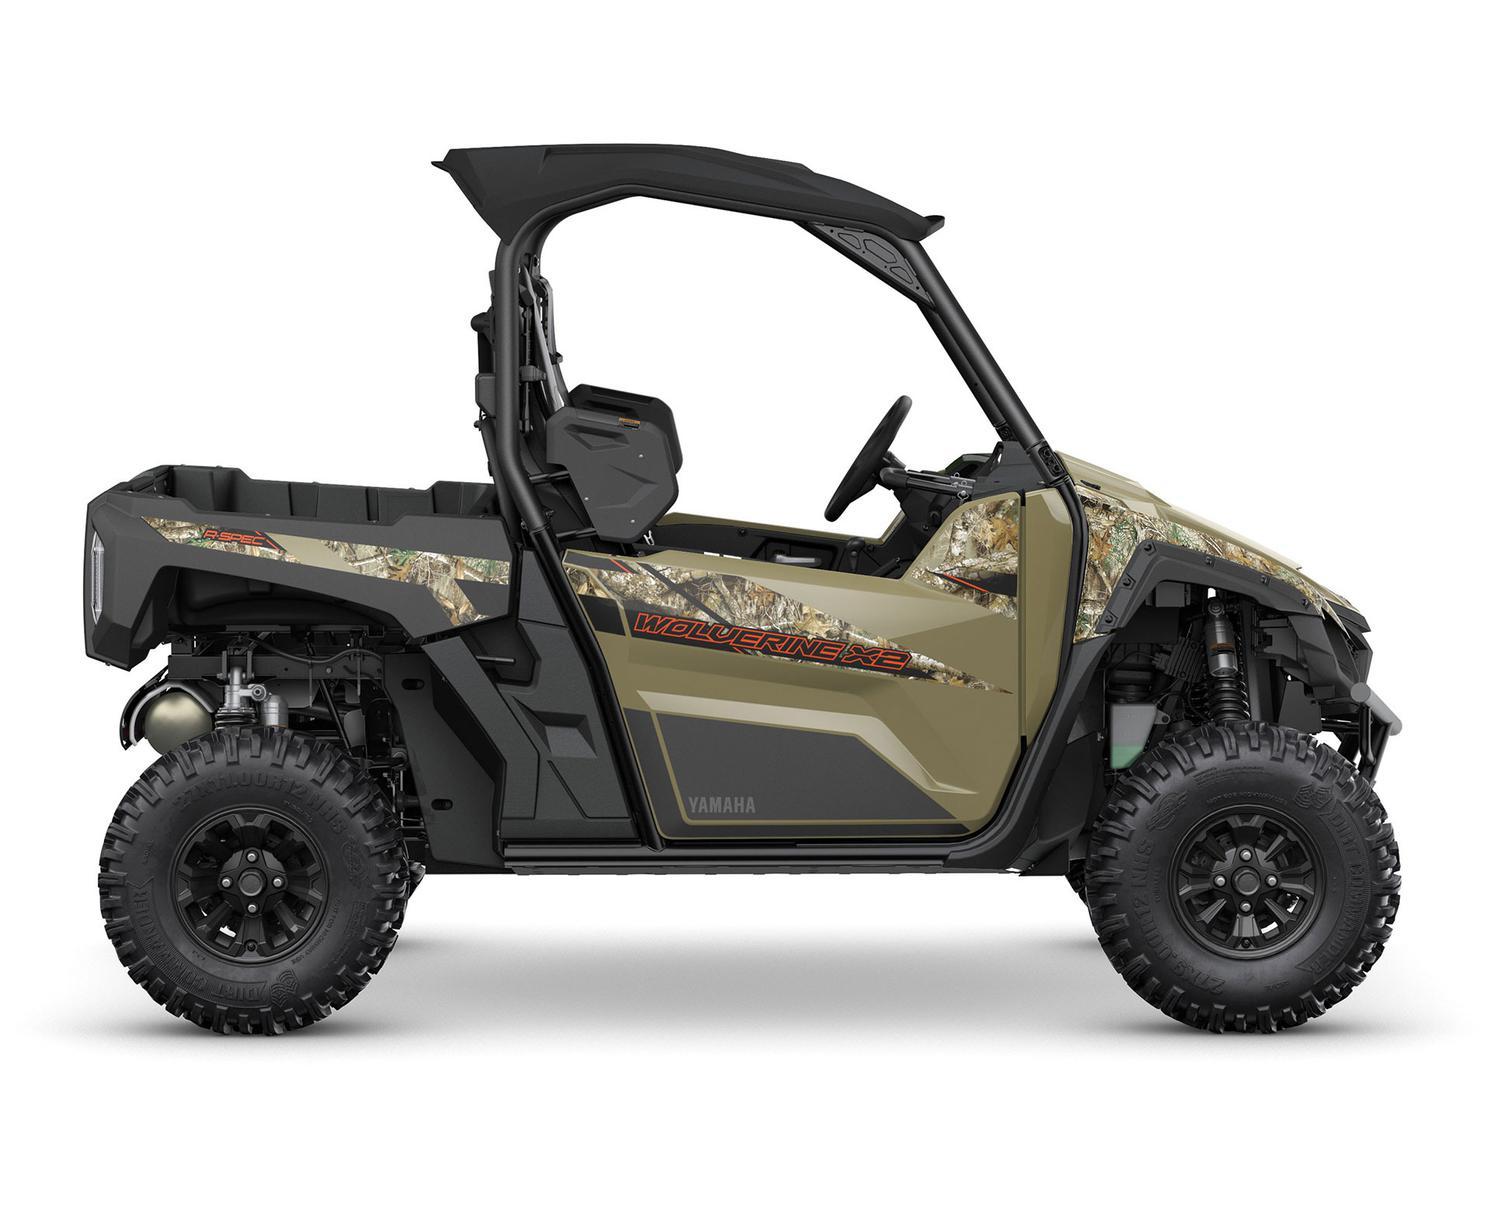 2021 Yamaha Wolverine X2 R-SPEC 850 EPS Realtree Edge Camouflage